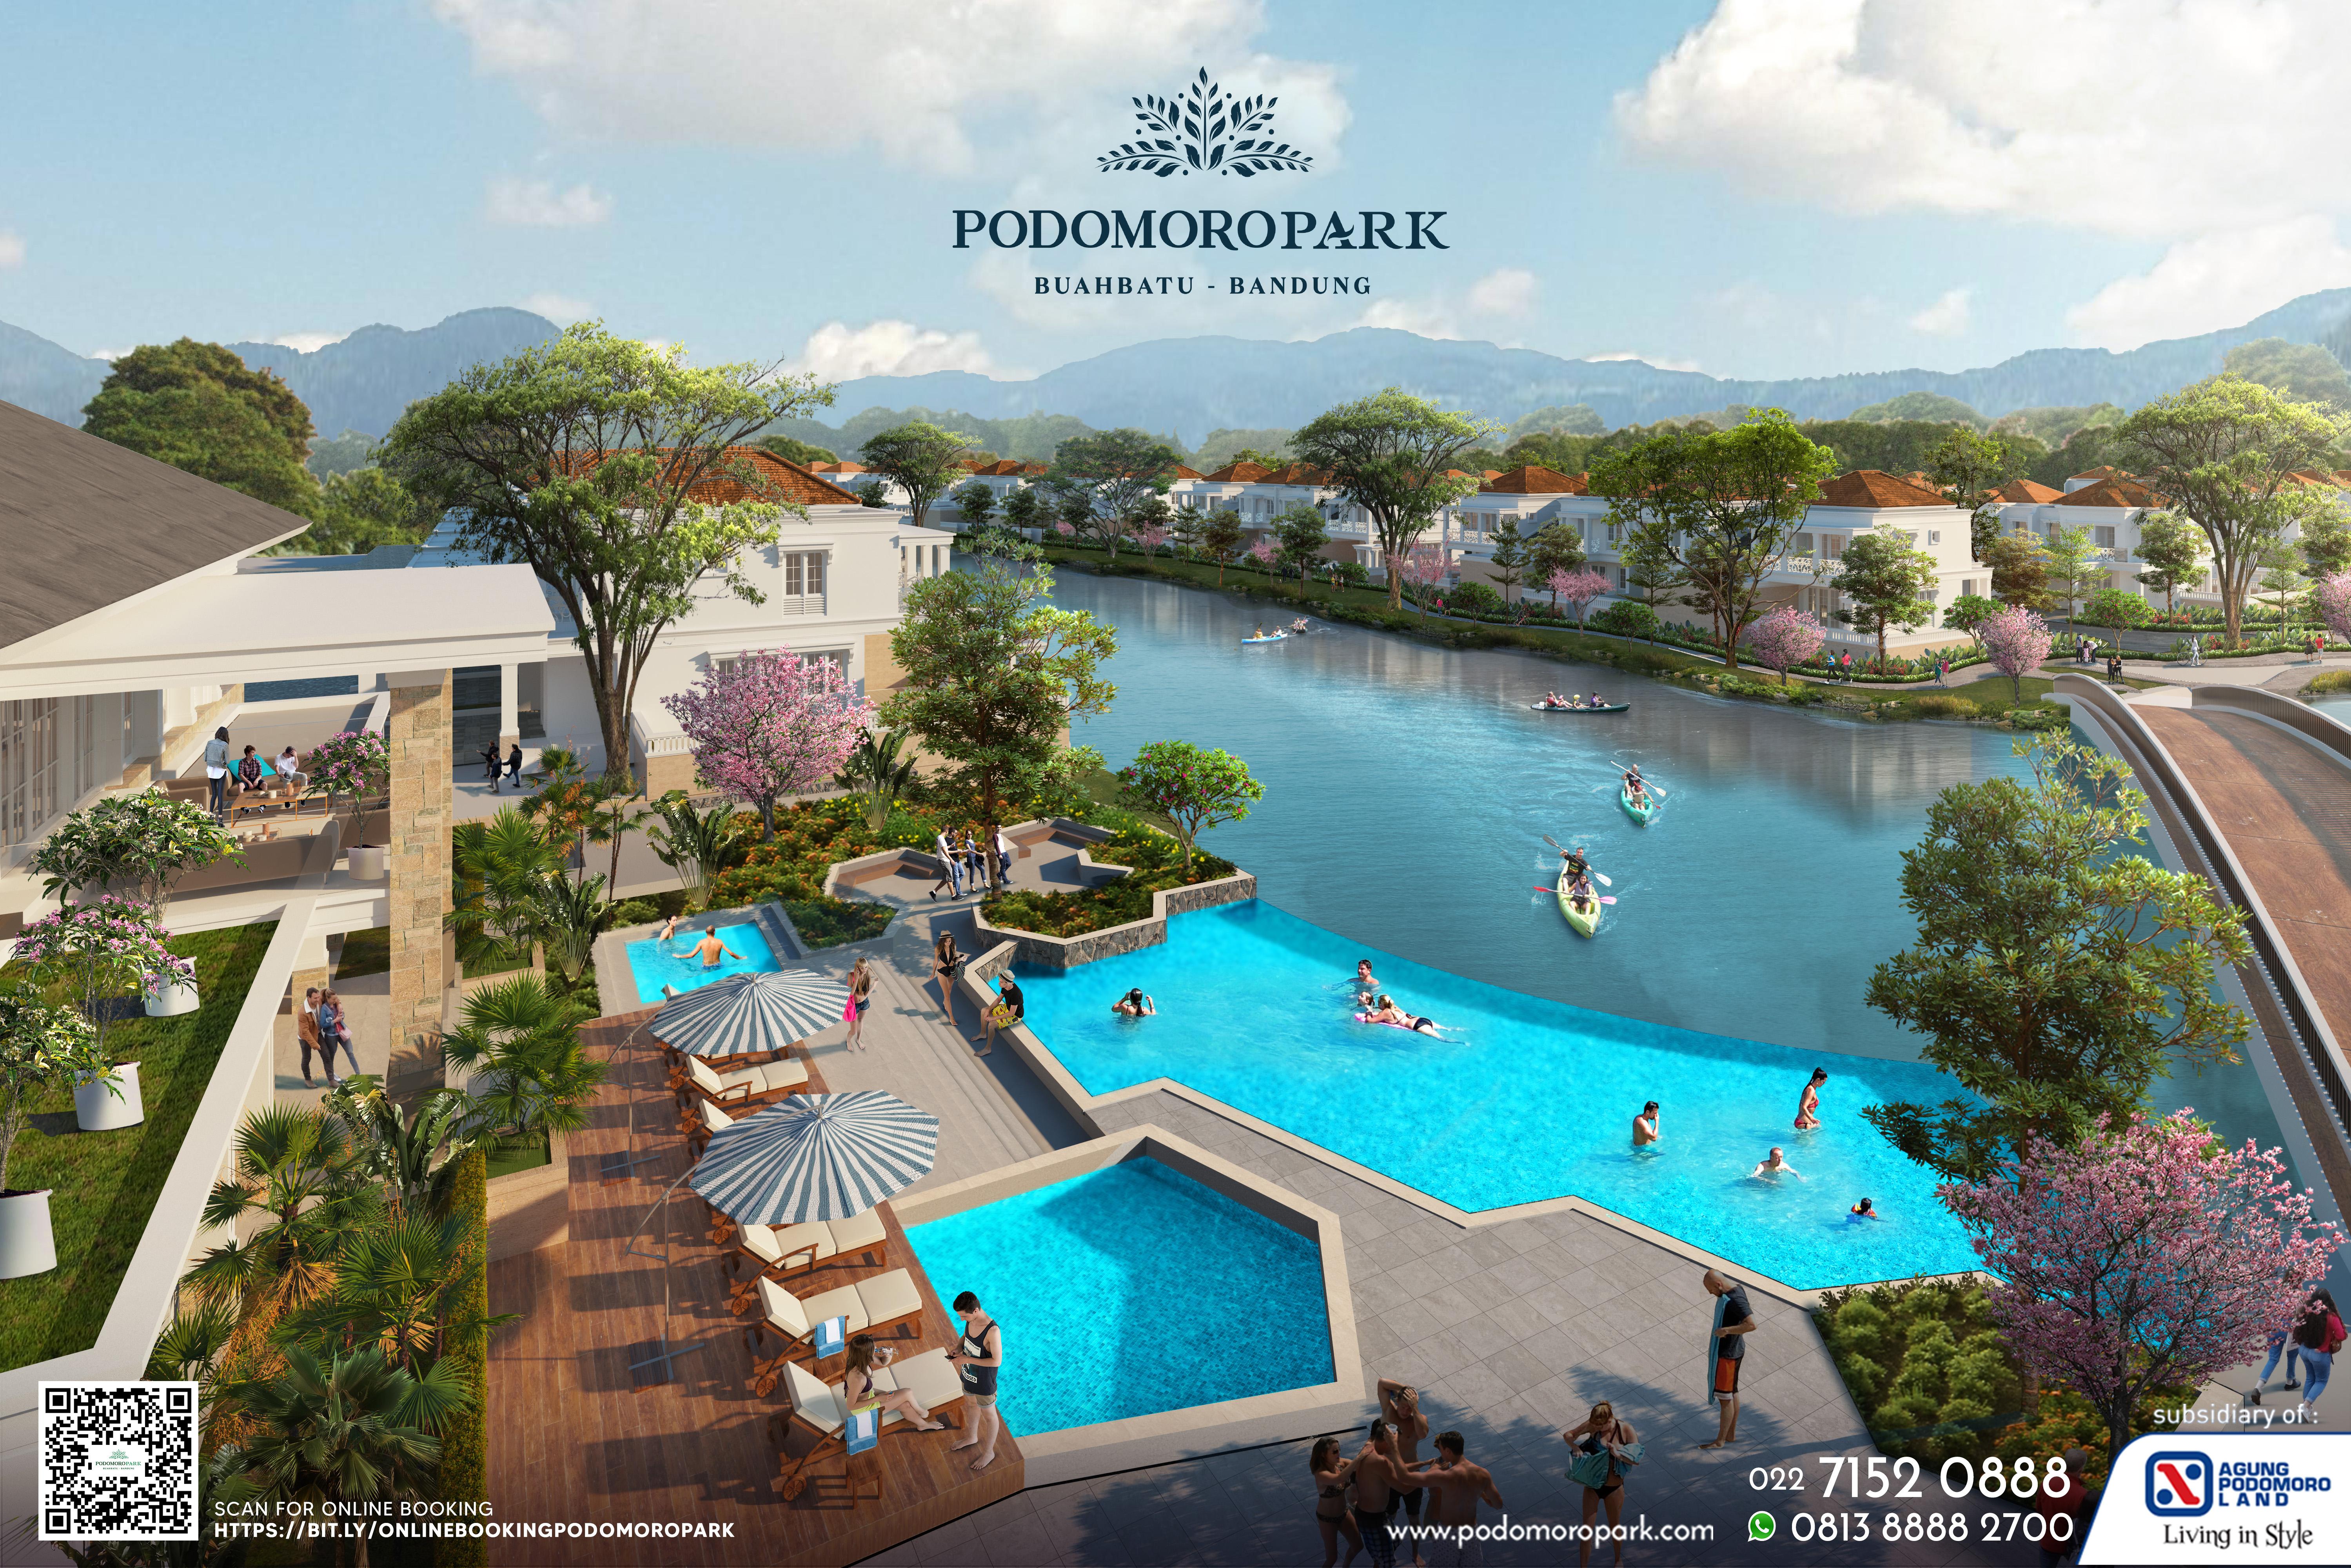 Berita terbaru Podomoro Park Bandung